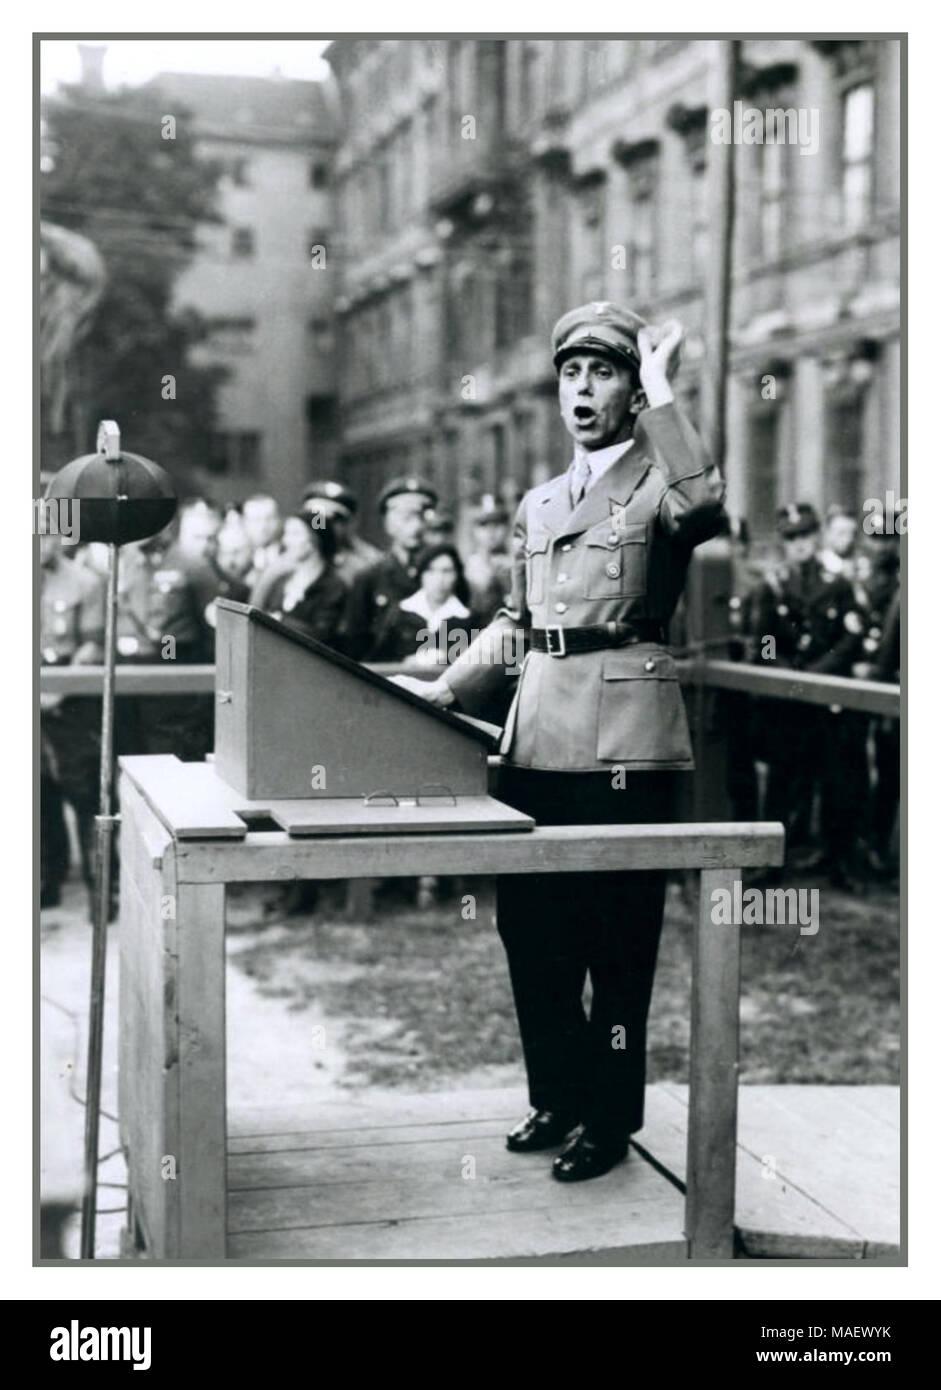 Joseph Goebbels Nazi Propaganda Minister in NSDAP uniform making passionate speech Berlin, Germany 25. August 1934 - Stock Image